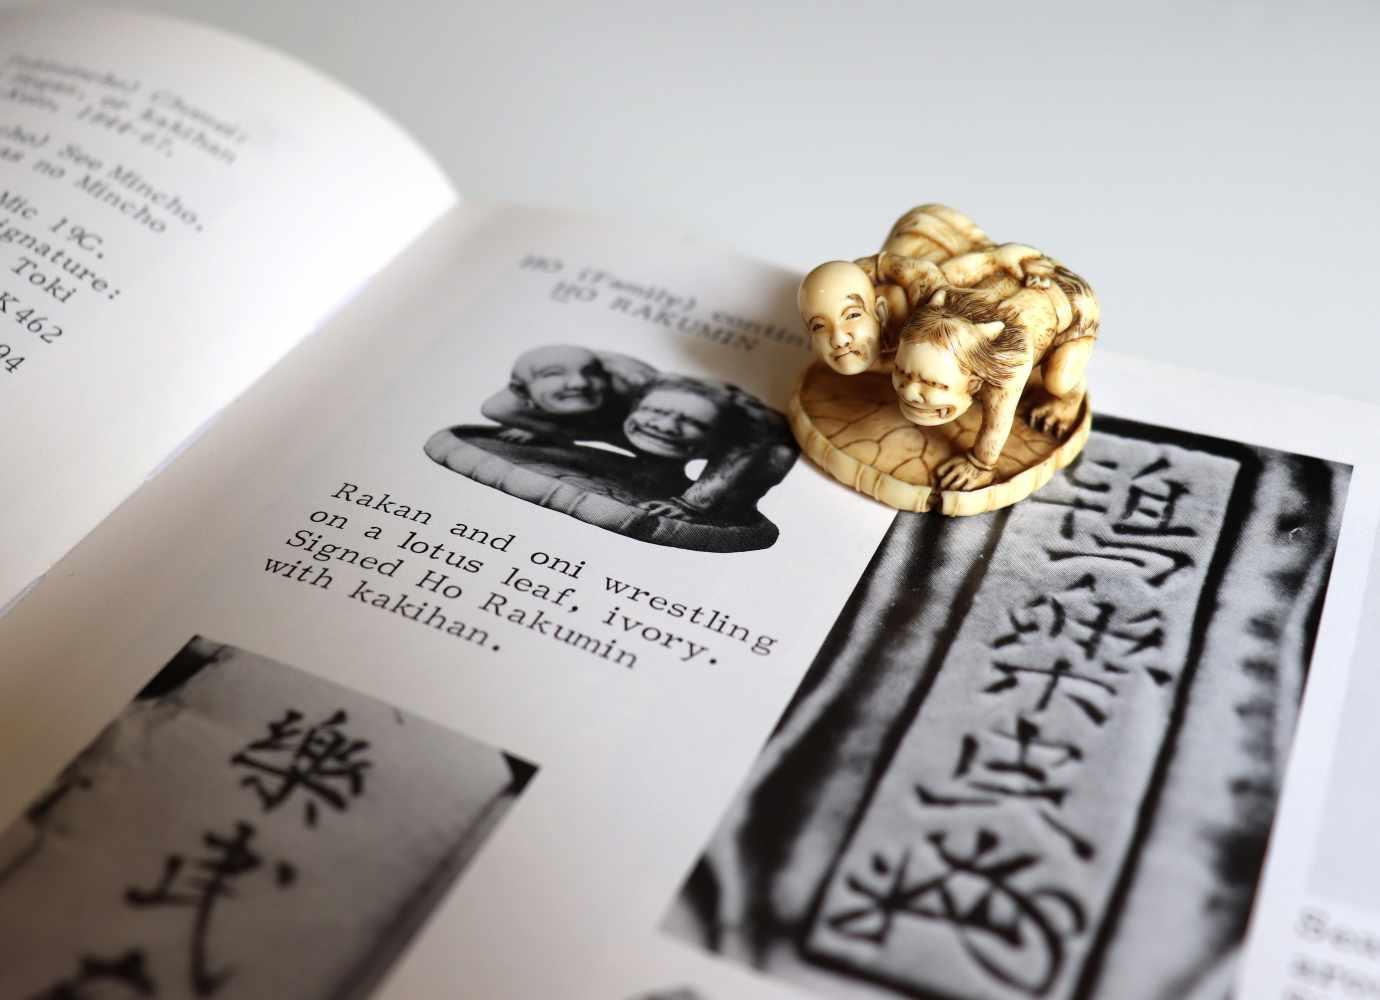 HO RAKUMIN: A FINE IVORY NETSUKE OF JIZO WRESTLING AN ONI By Ho Rakumin, signed Ho Rakumin with - Image 10 of 11